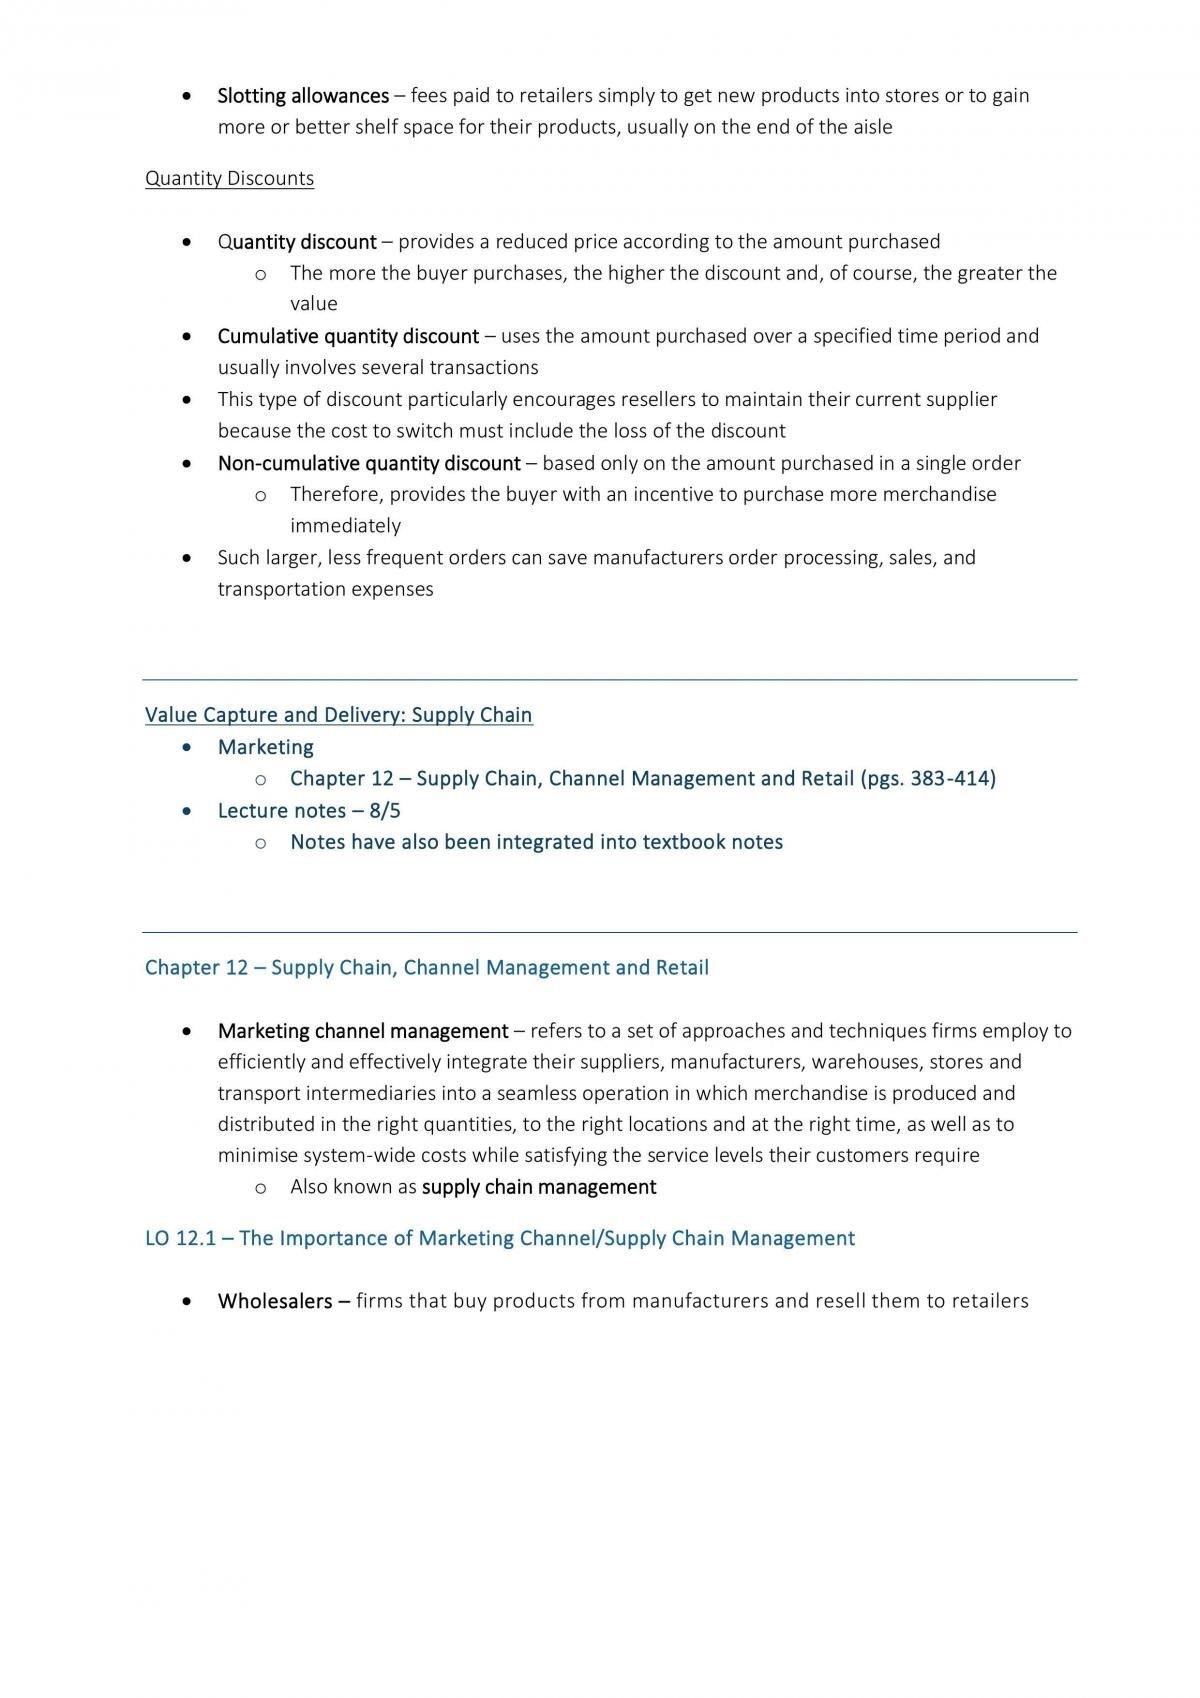 Comprehensive Set of MARK1012 Notes - Page 76